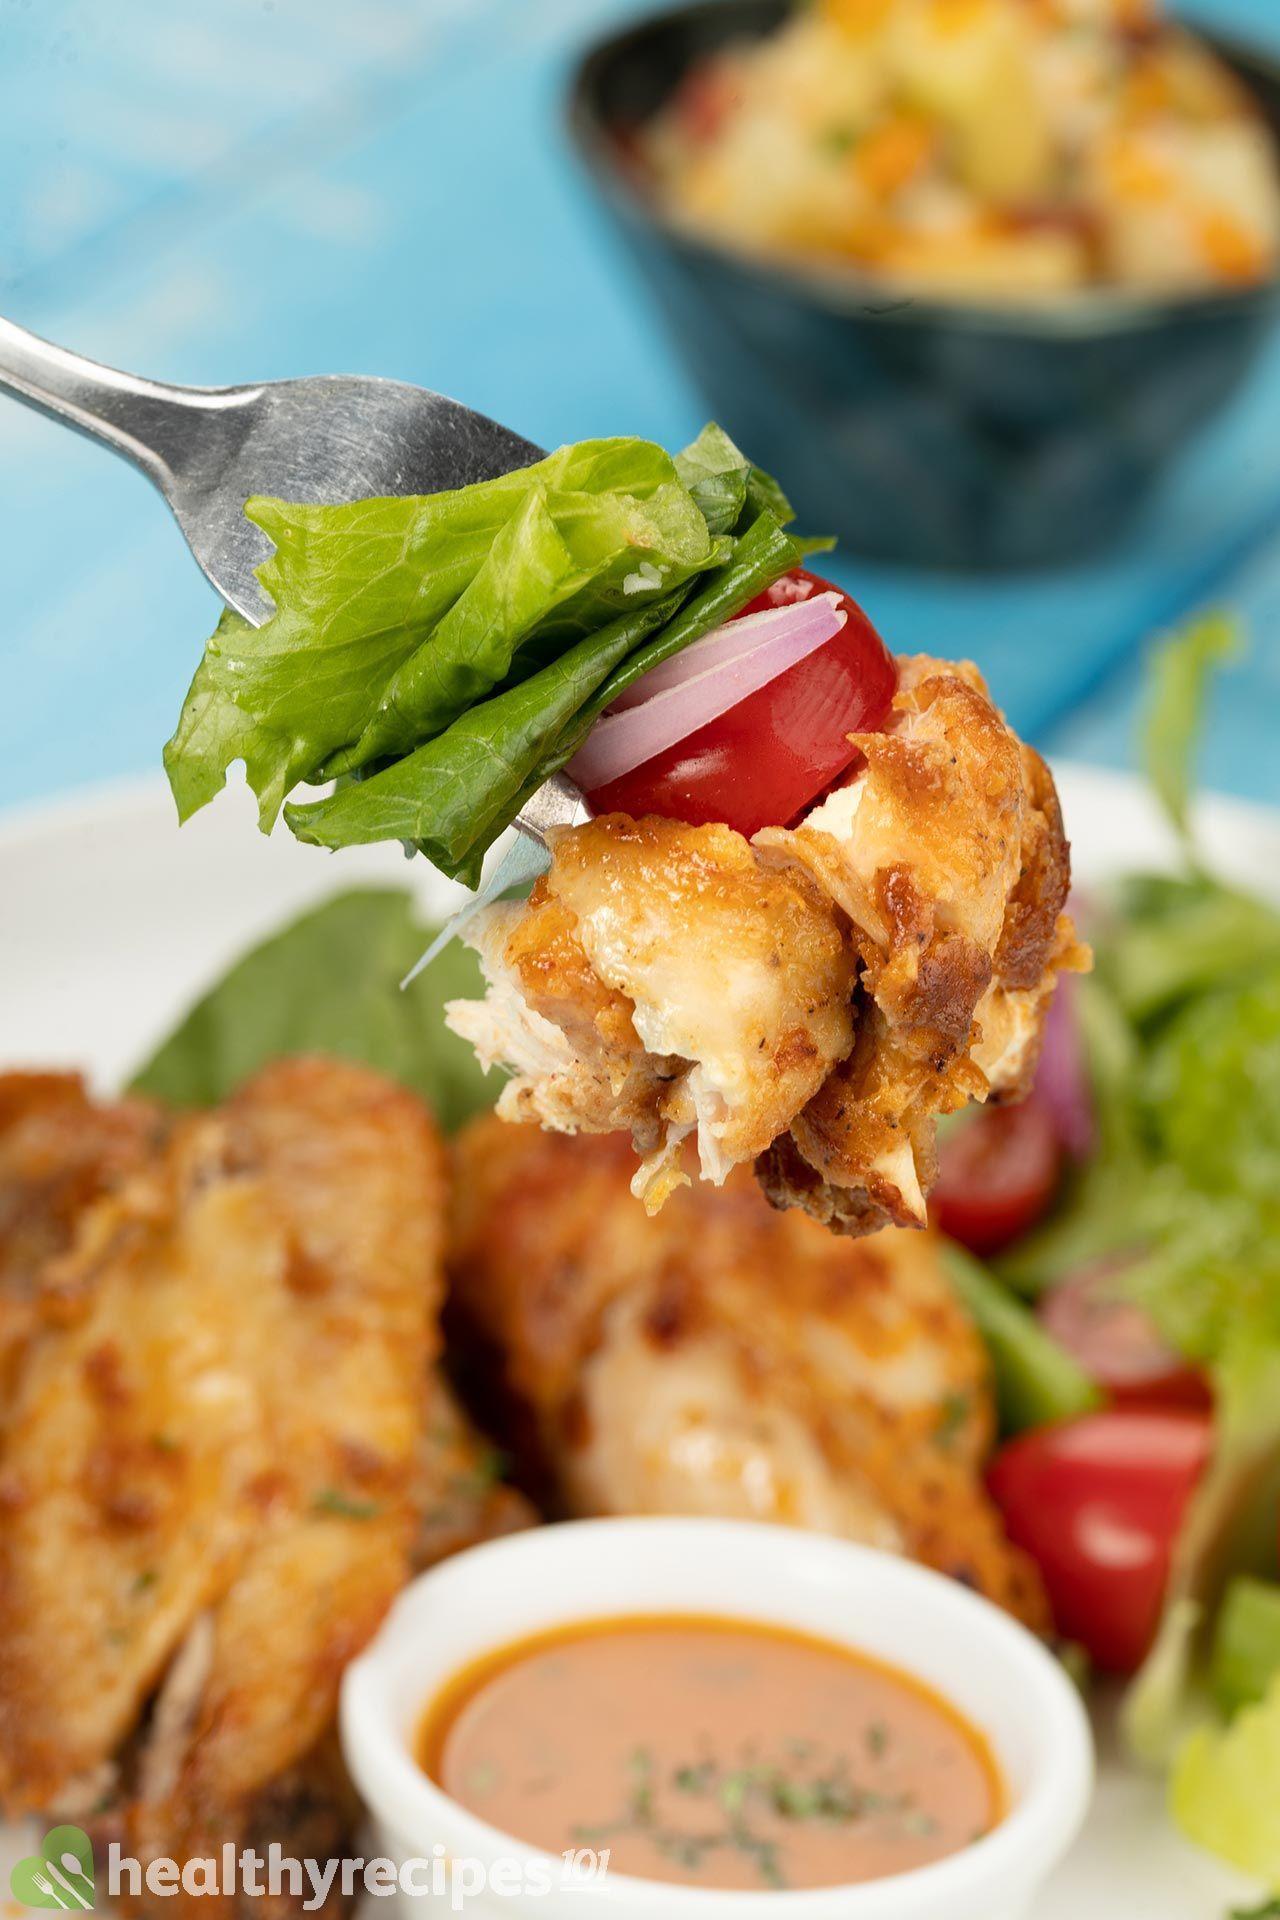 Homemade Air Fryer Chicken Wings Recipe